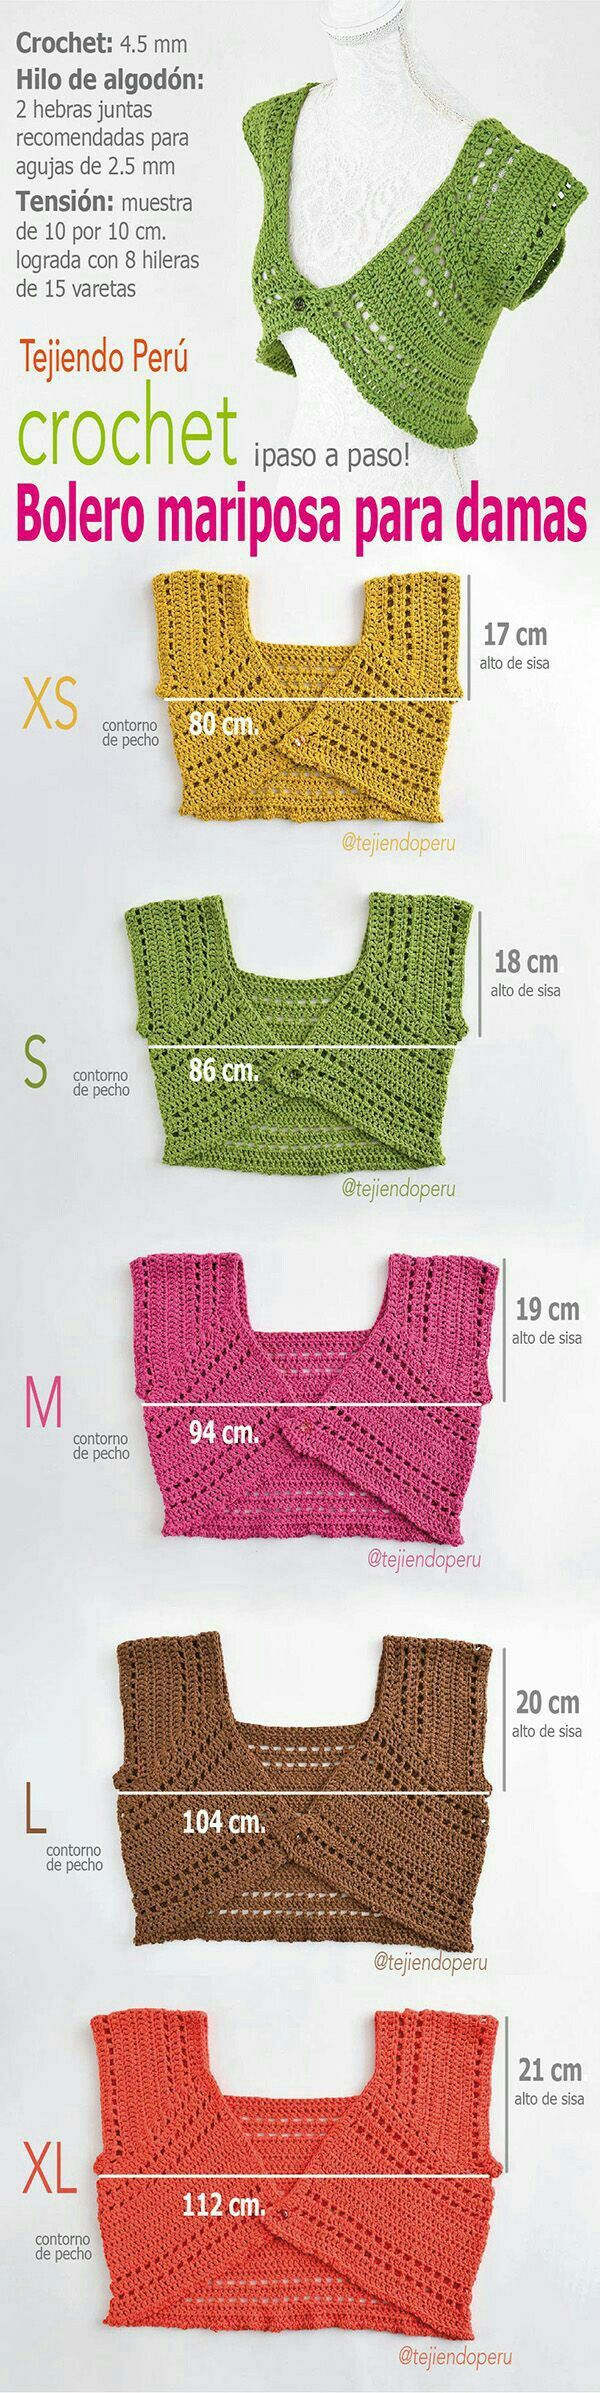 Bolero mariposa para damas   tejidos crochet   Pinterest   Kleidung ...